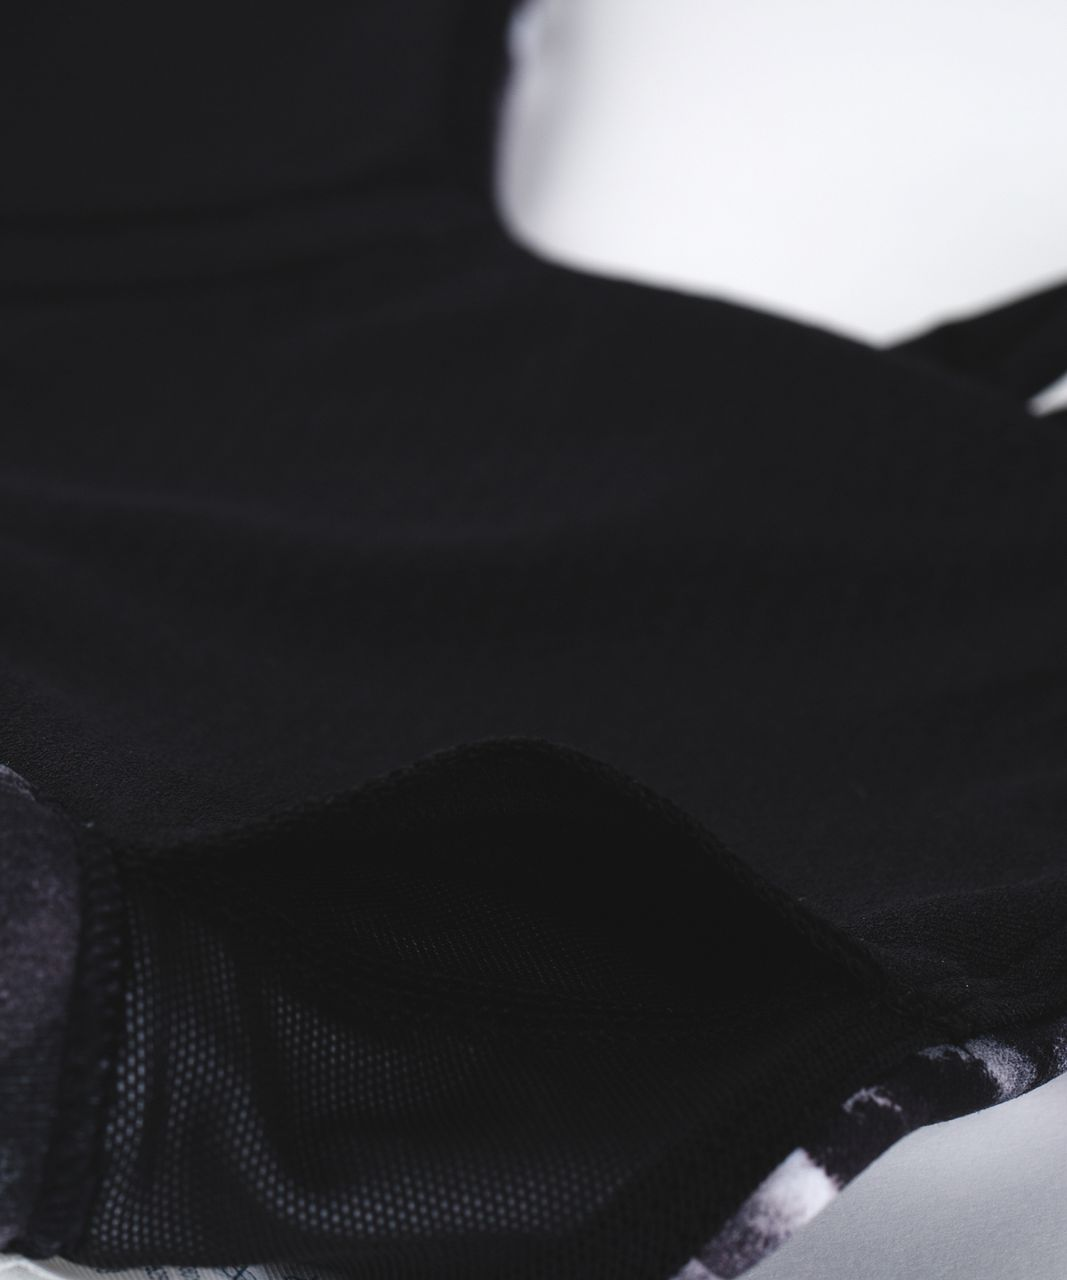 Lululemon Free To Be Zen Bra - Mini Obscurred Black Dusty Mauve / Black